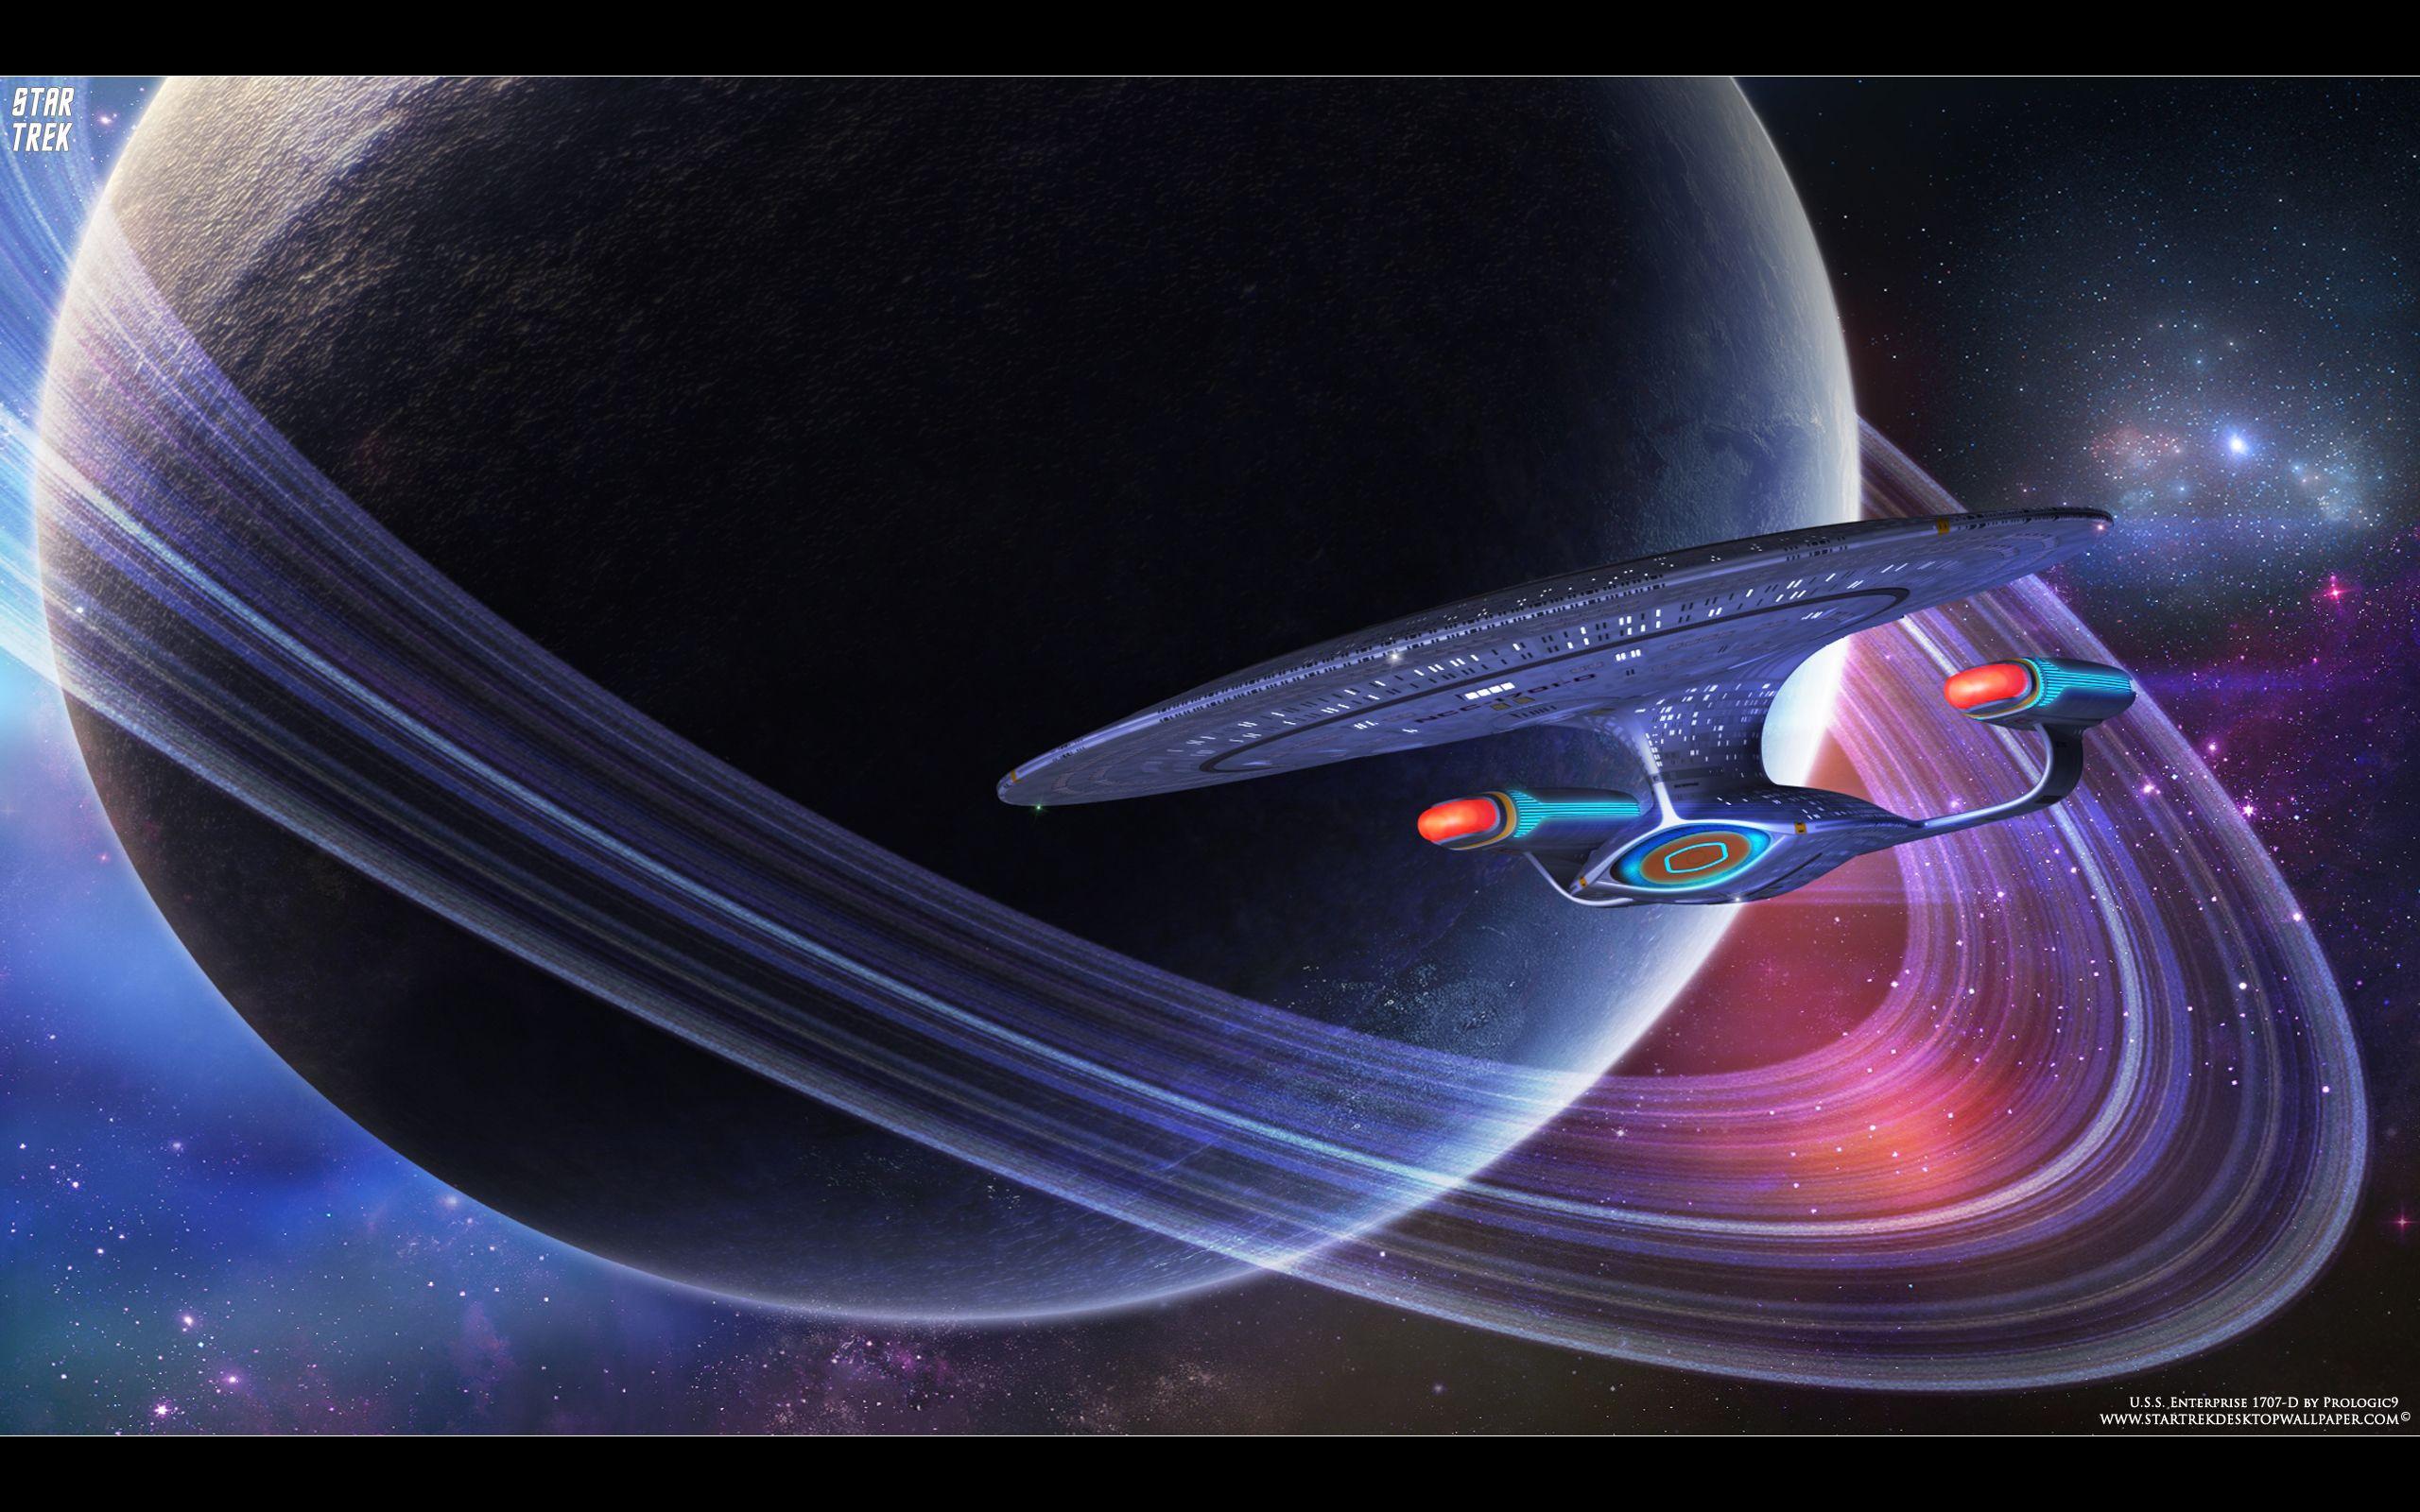 Uss Enterprise Ncc 1701d Free Star Trek Computer Desktop Wallpaper Pictures Images Star Trek Wallpaper Star Trek Star Trek Wallpaper Backgrounds